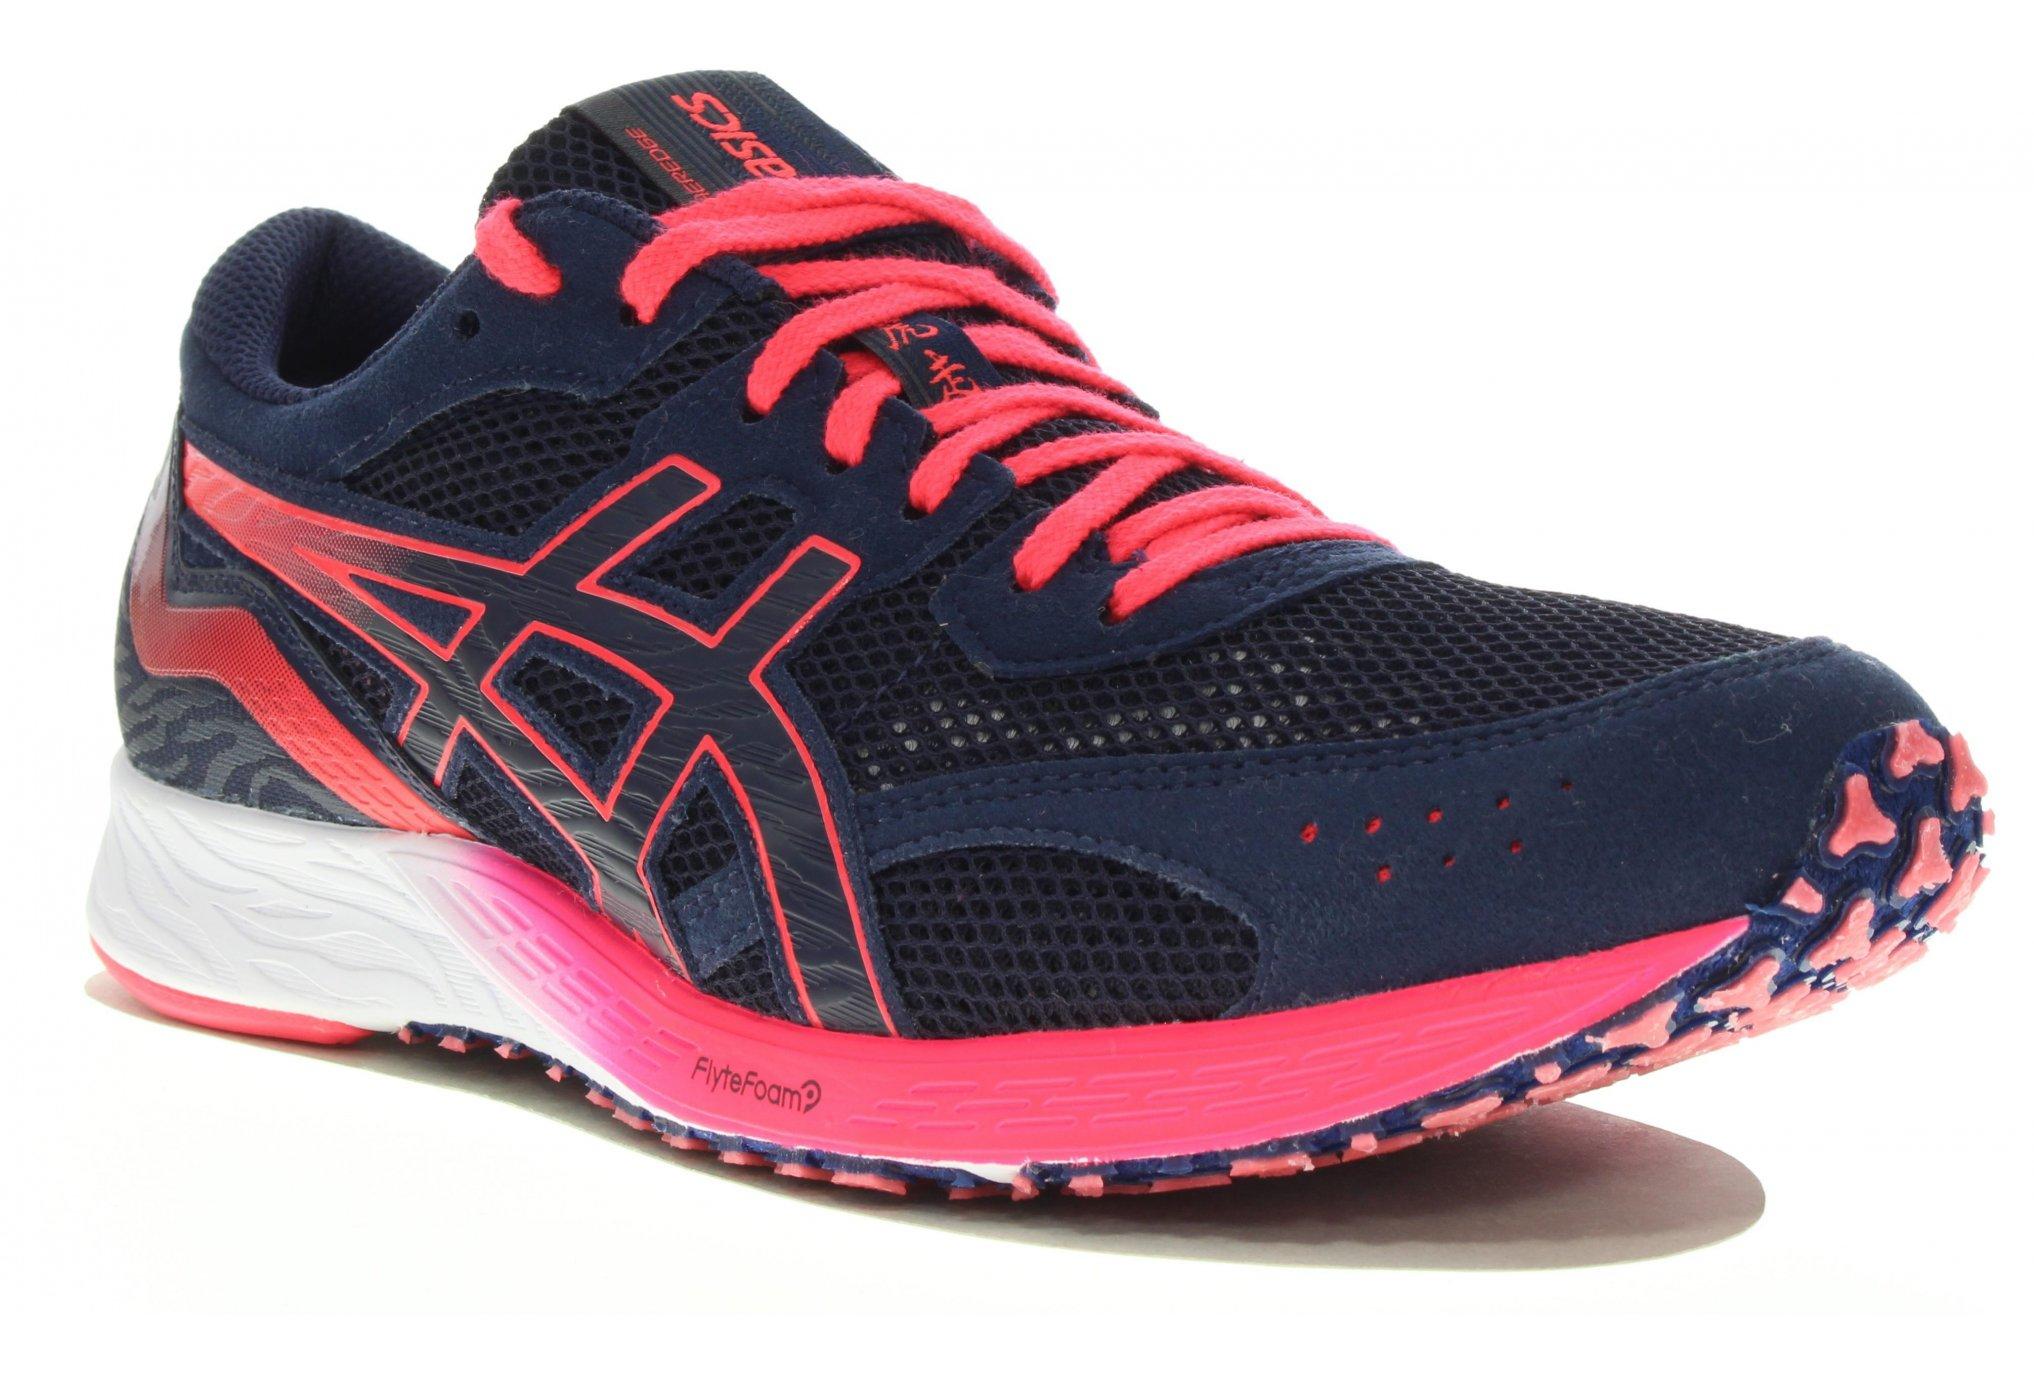 Asics Tartheredge Chaussures running femme